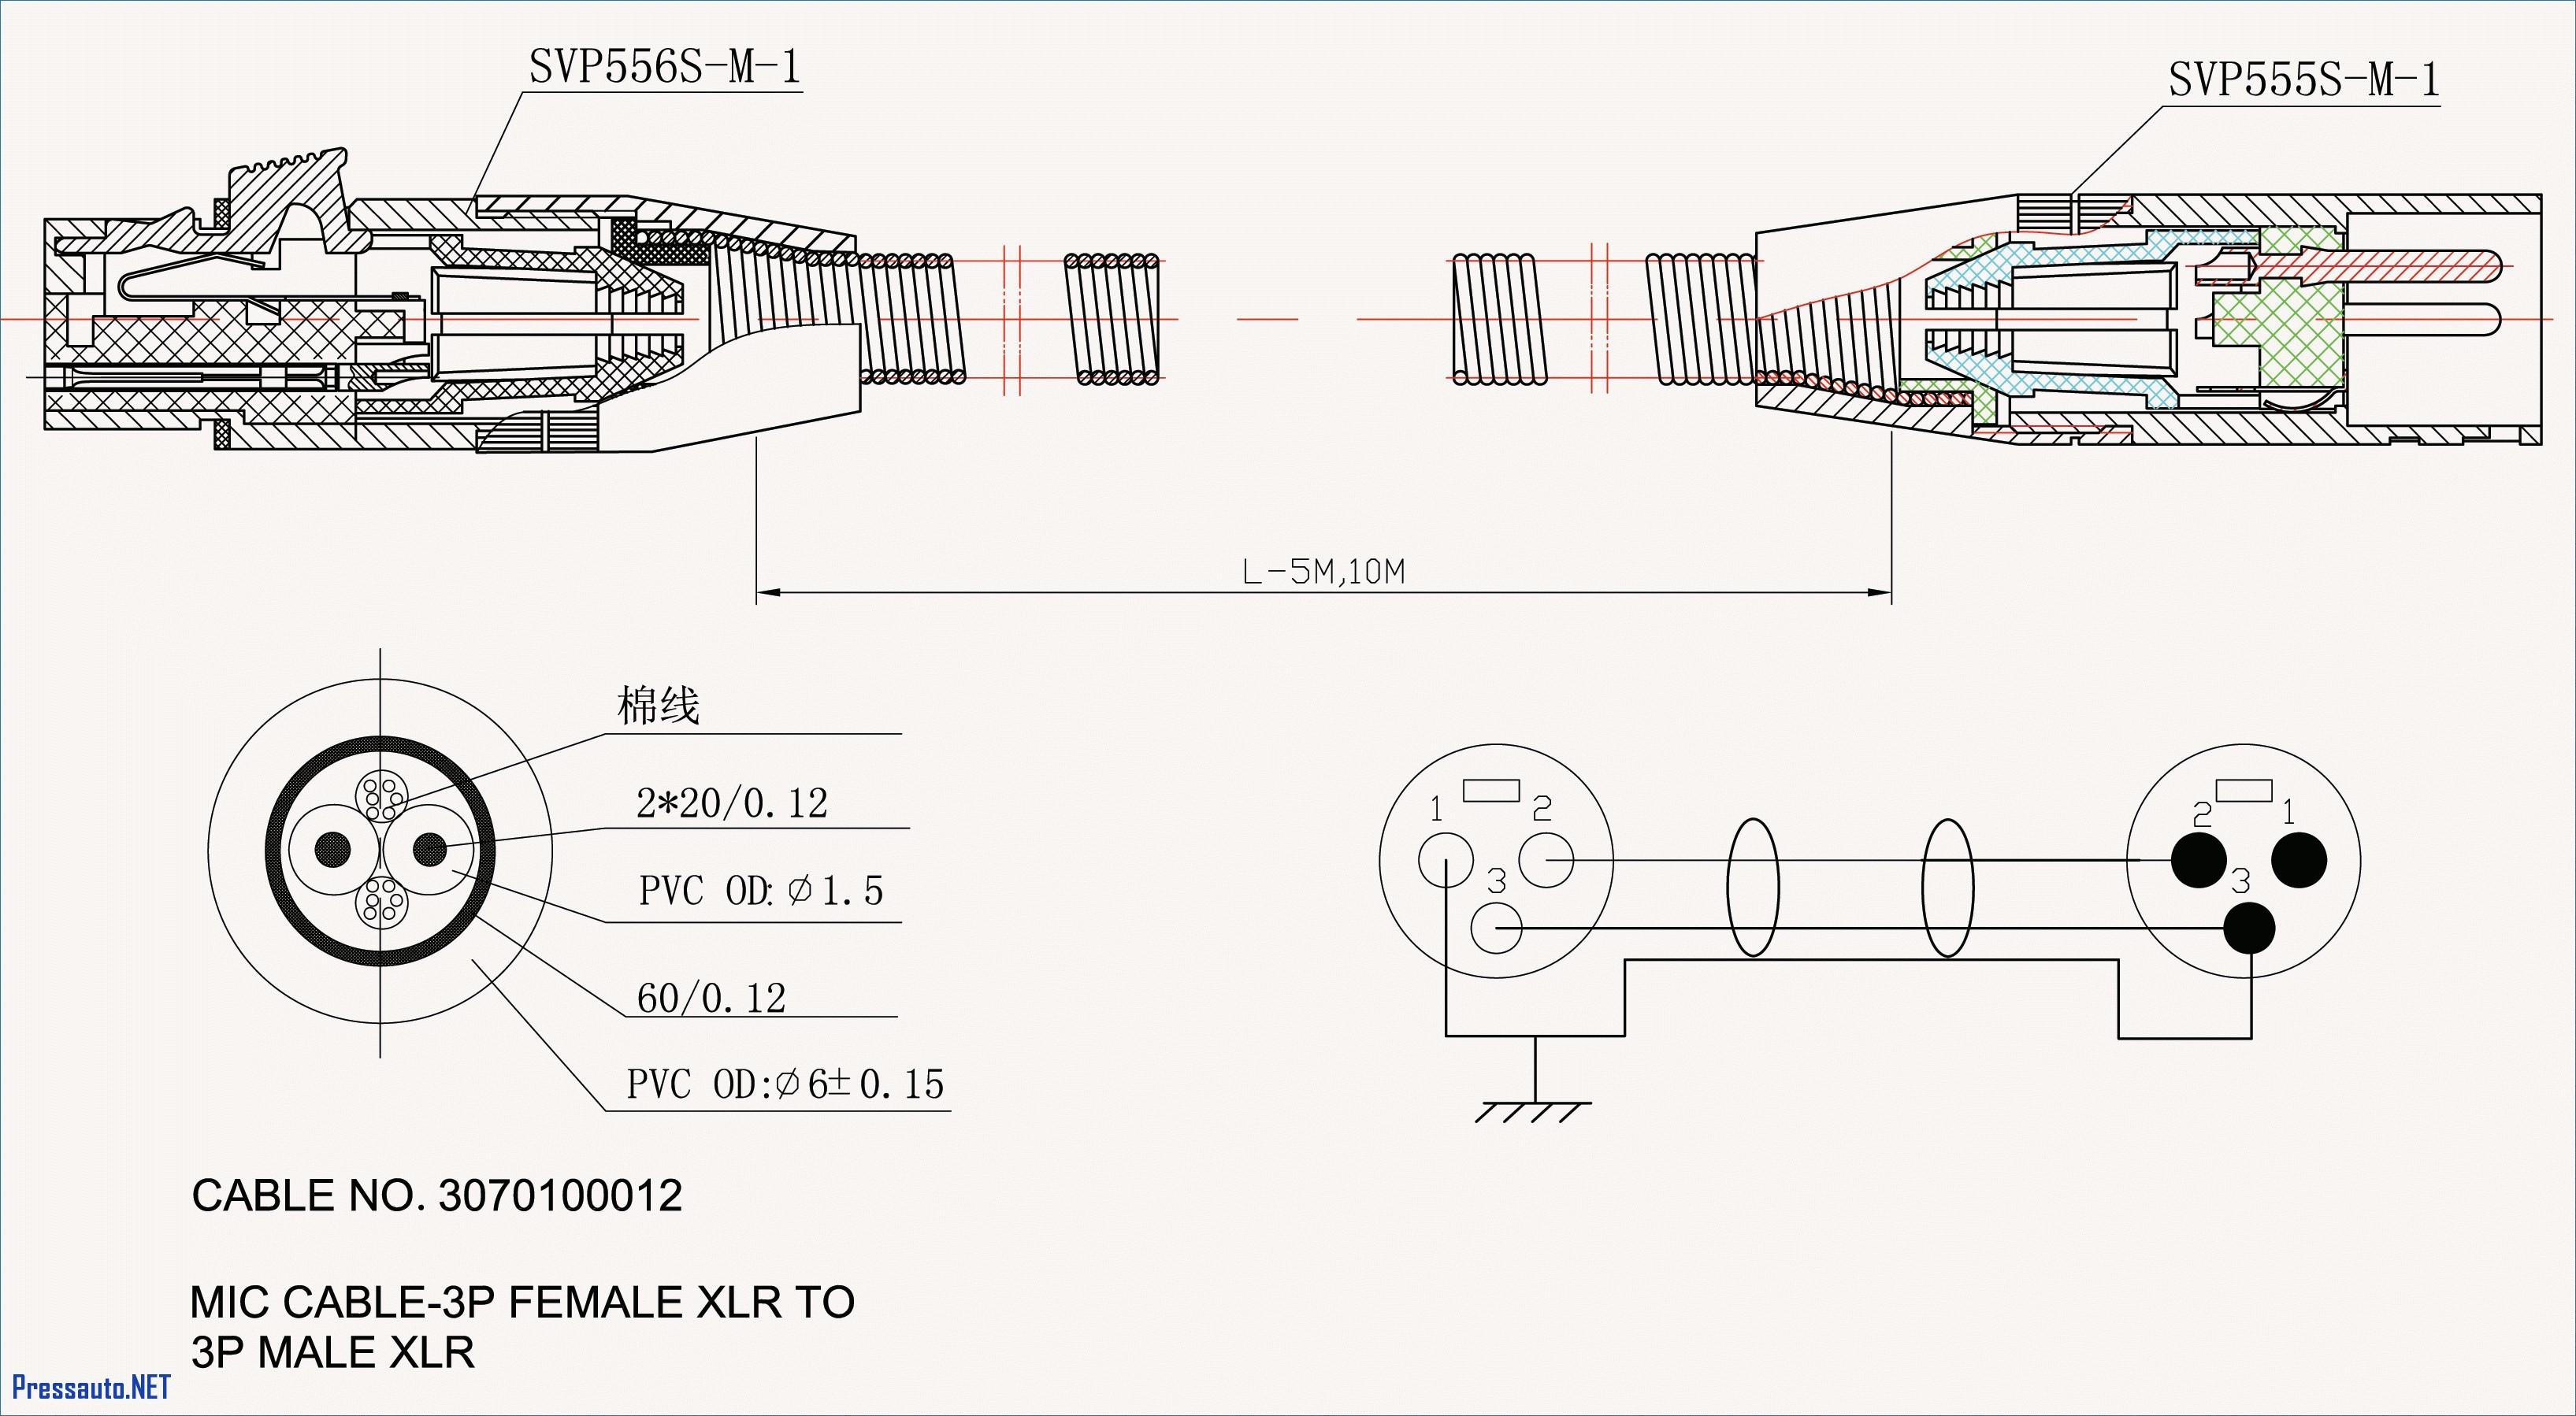 1999 Dodge Caravan Engine Diagram 1992 Dodge Caravan Wiring Diagram Experts Wiring Diagram • Of 1999 Dodge Caravan Engine Diagram